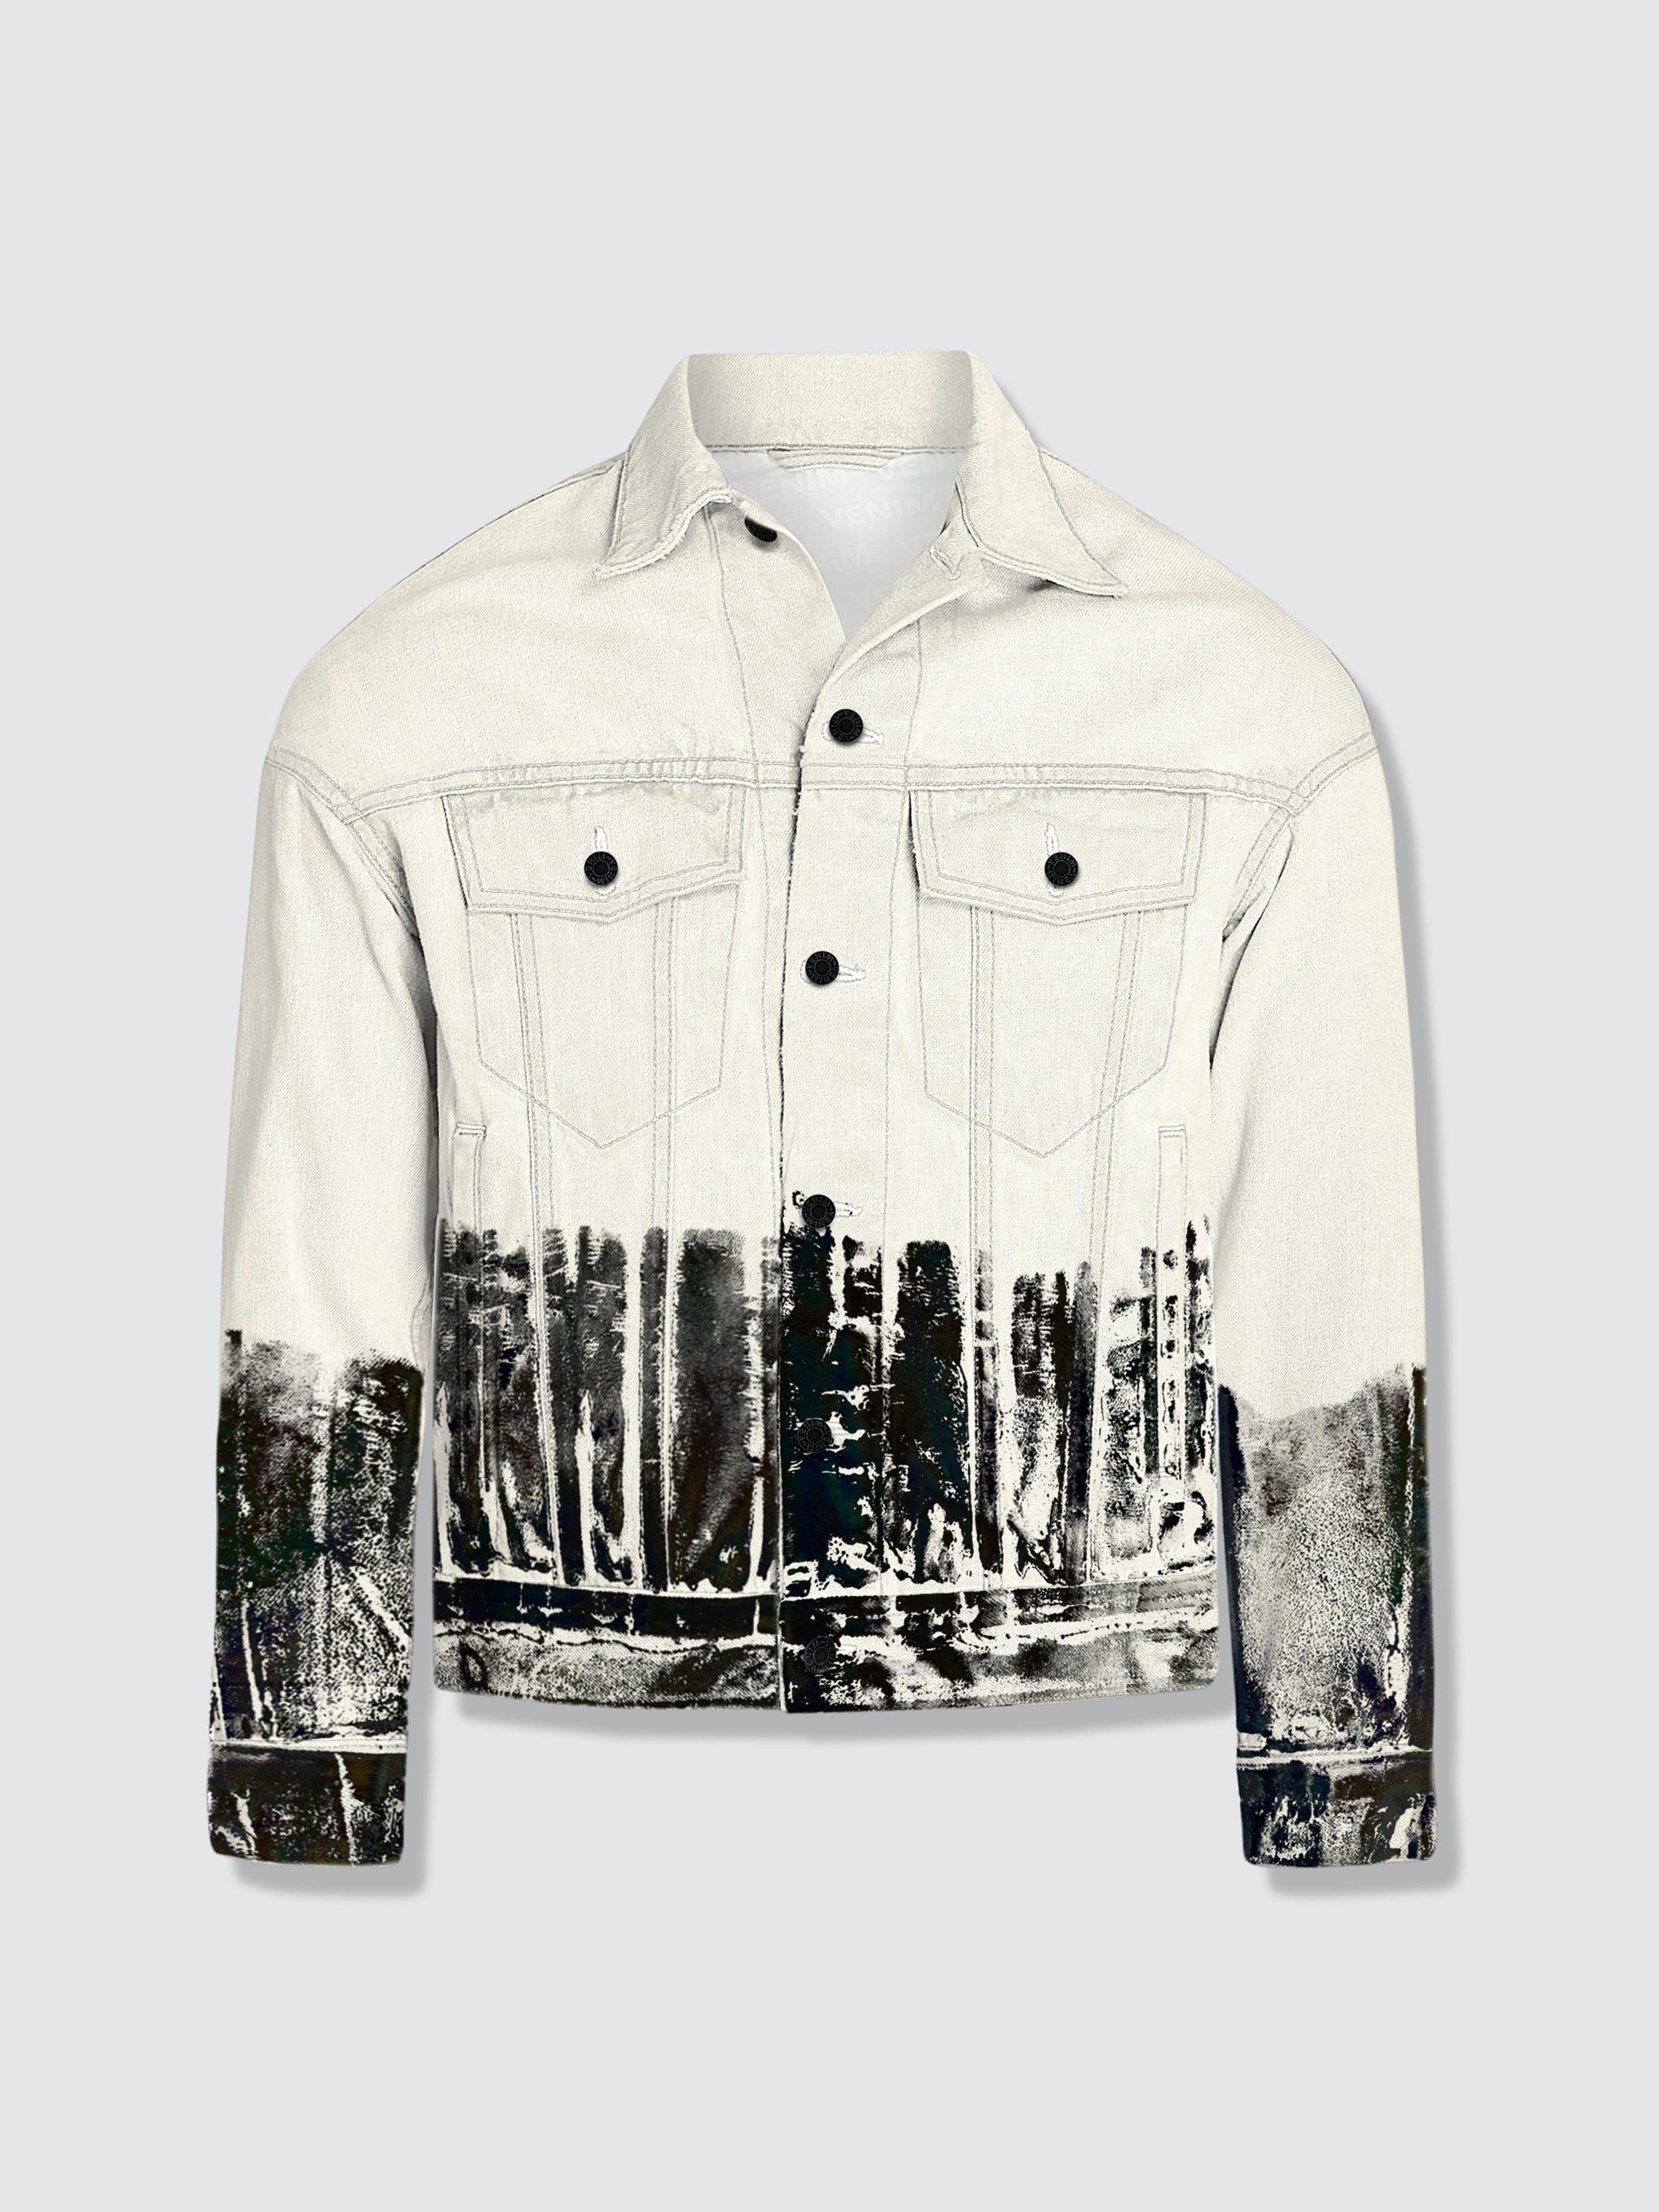 Venim Shorter Off-white Denim Jacket With Midnight Oil Foil